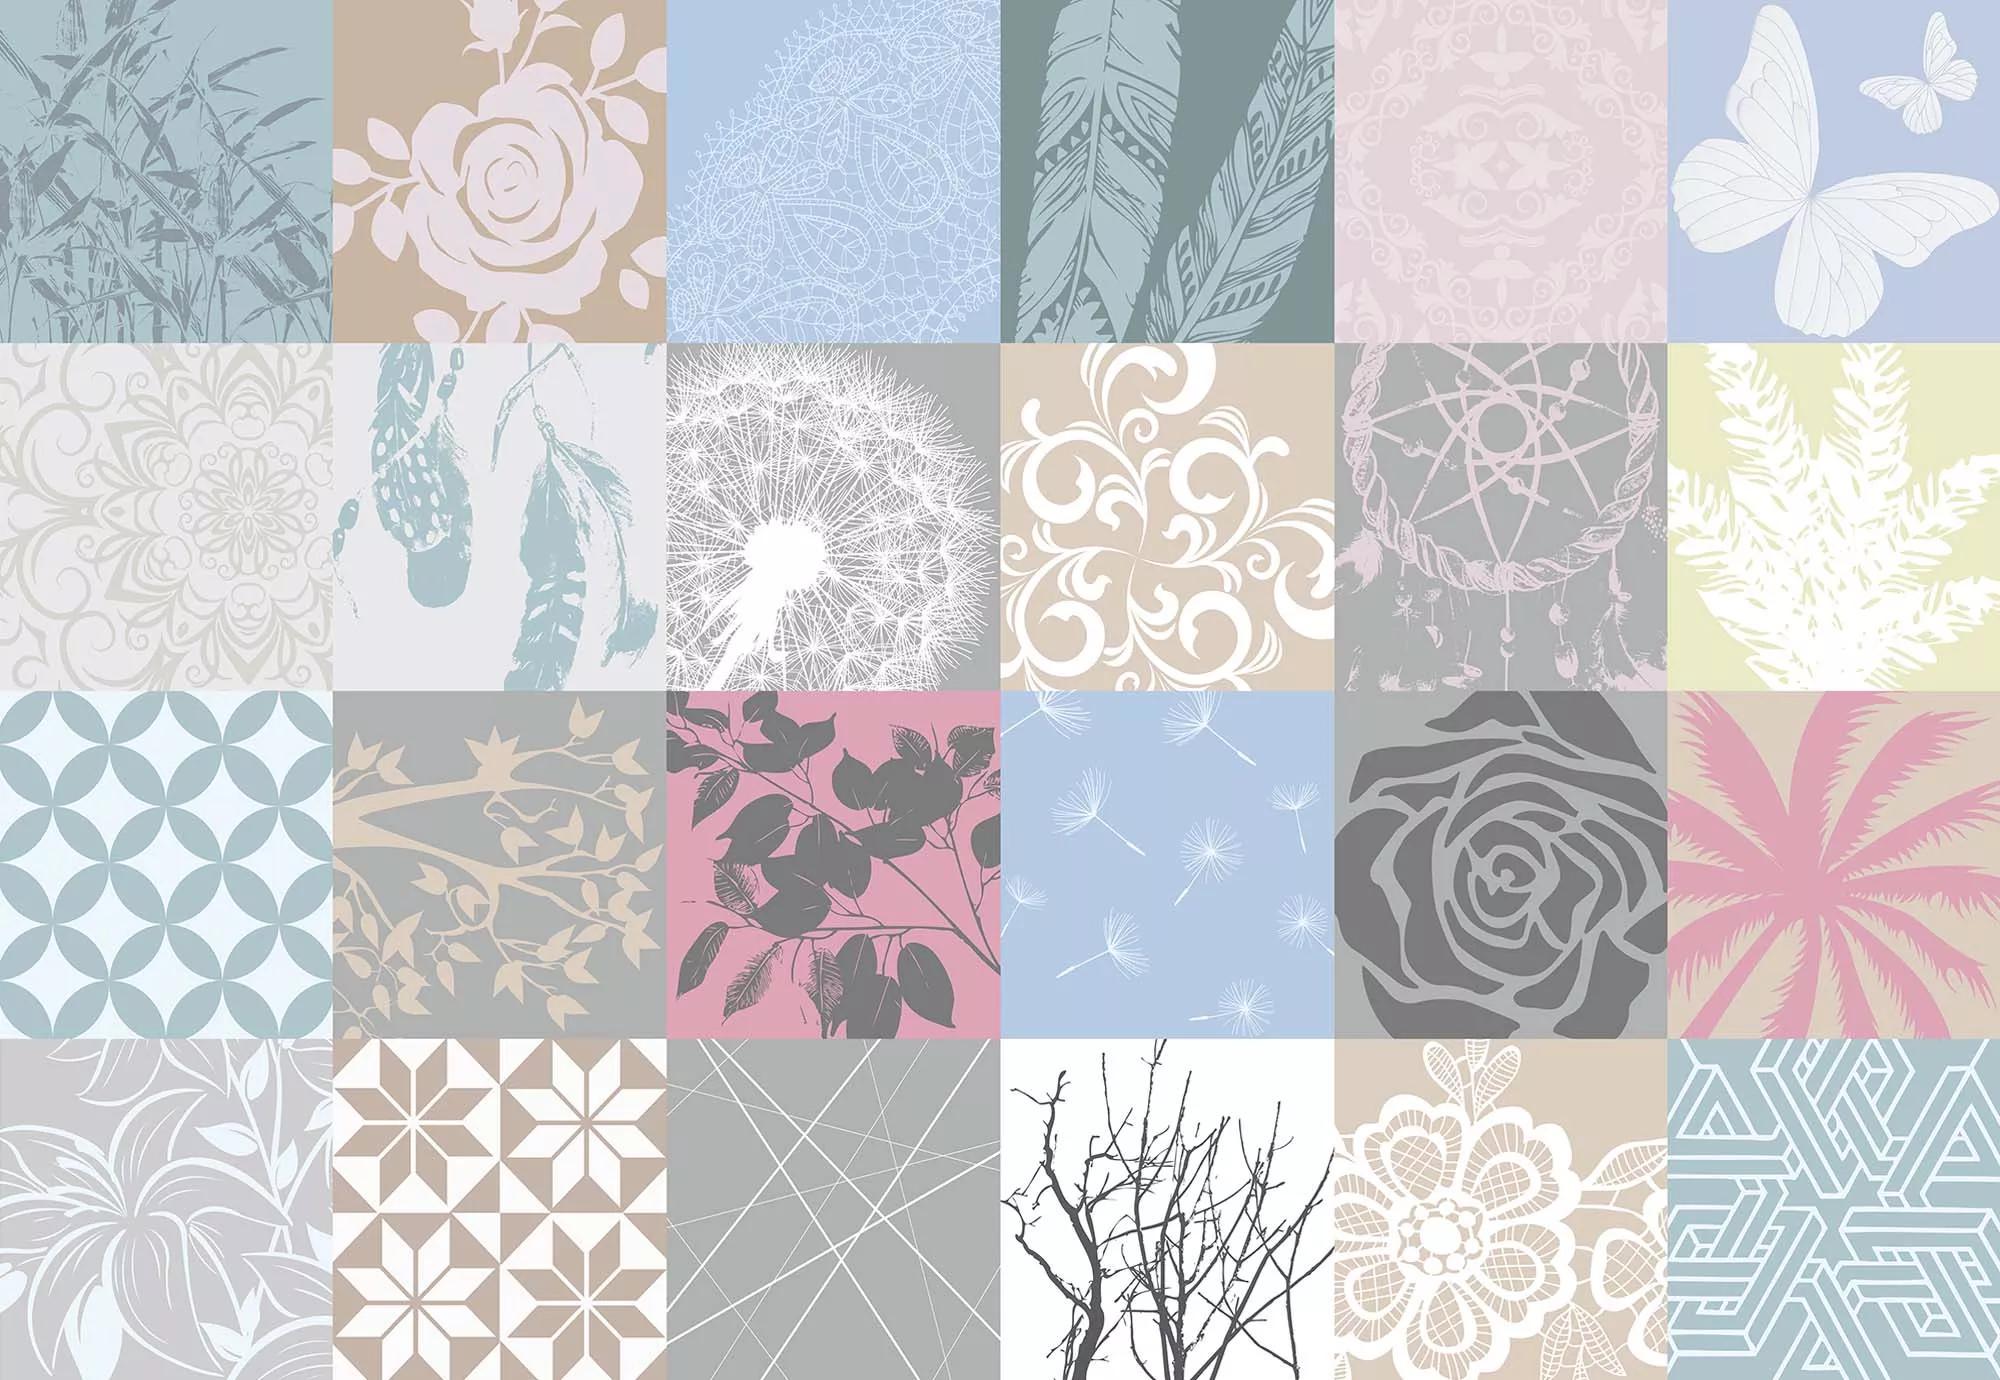 Fali poszter modern virág mintával